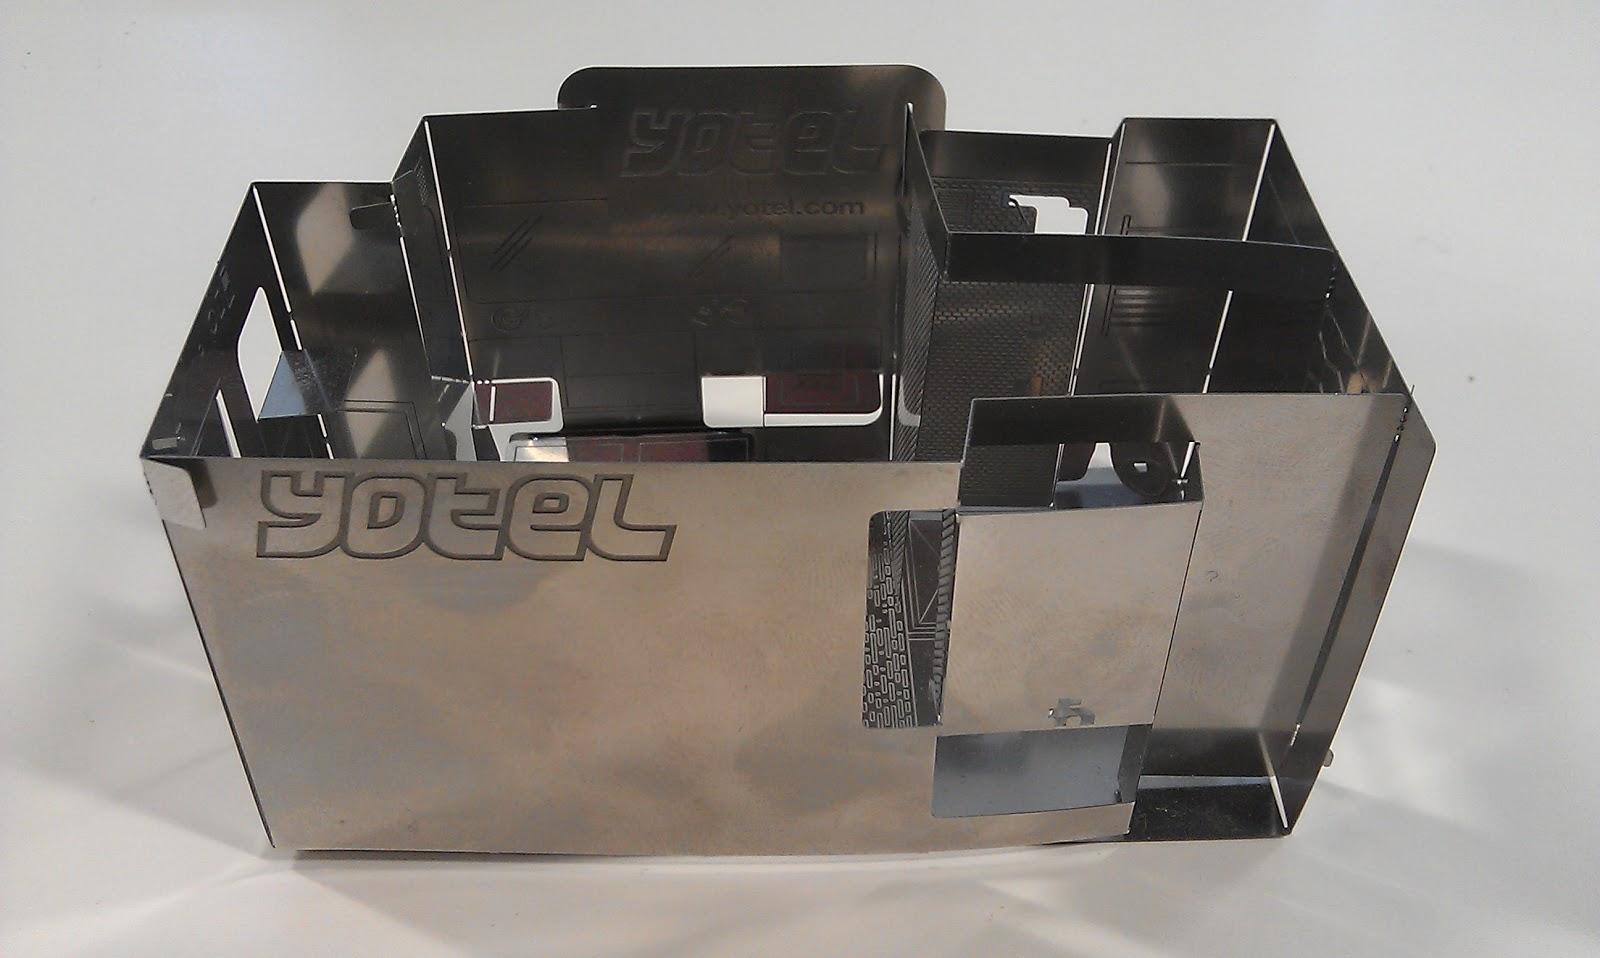 Yotel model room